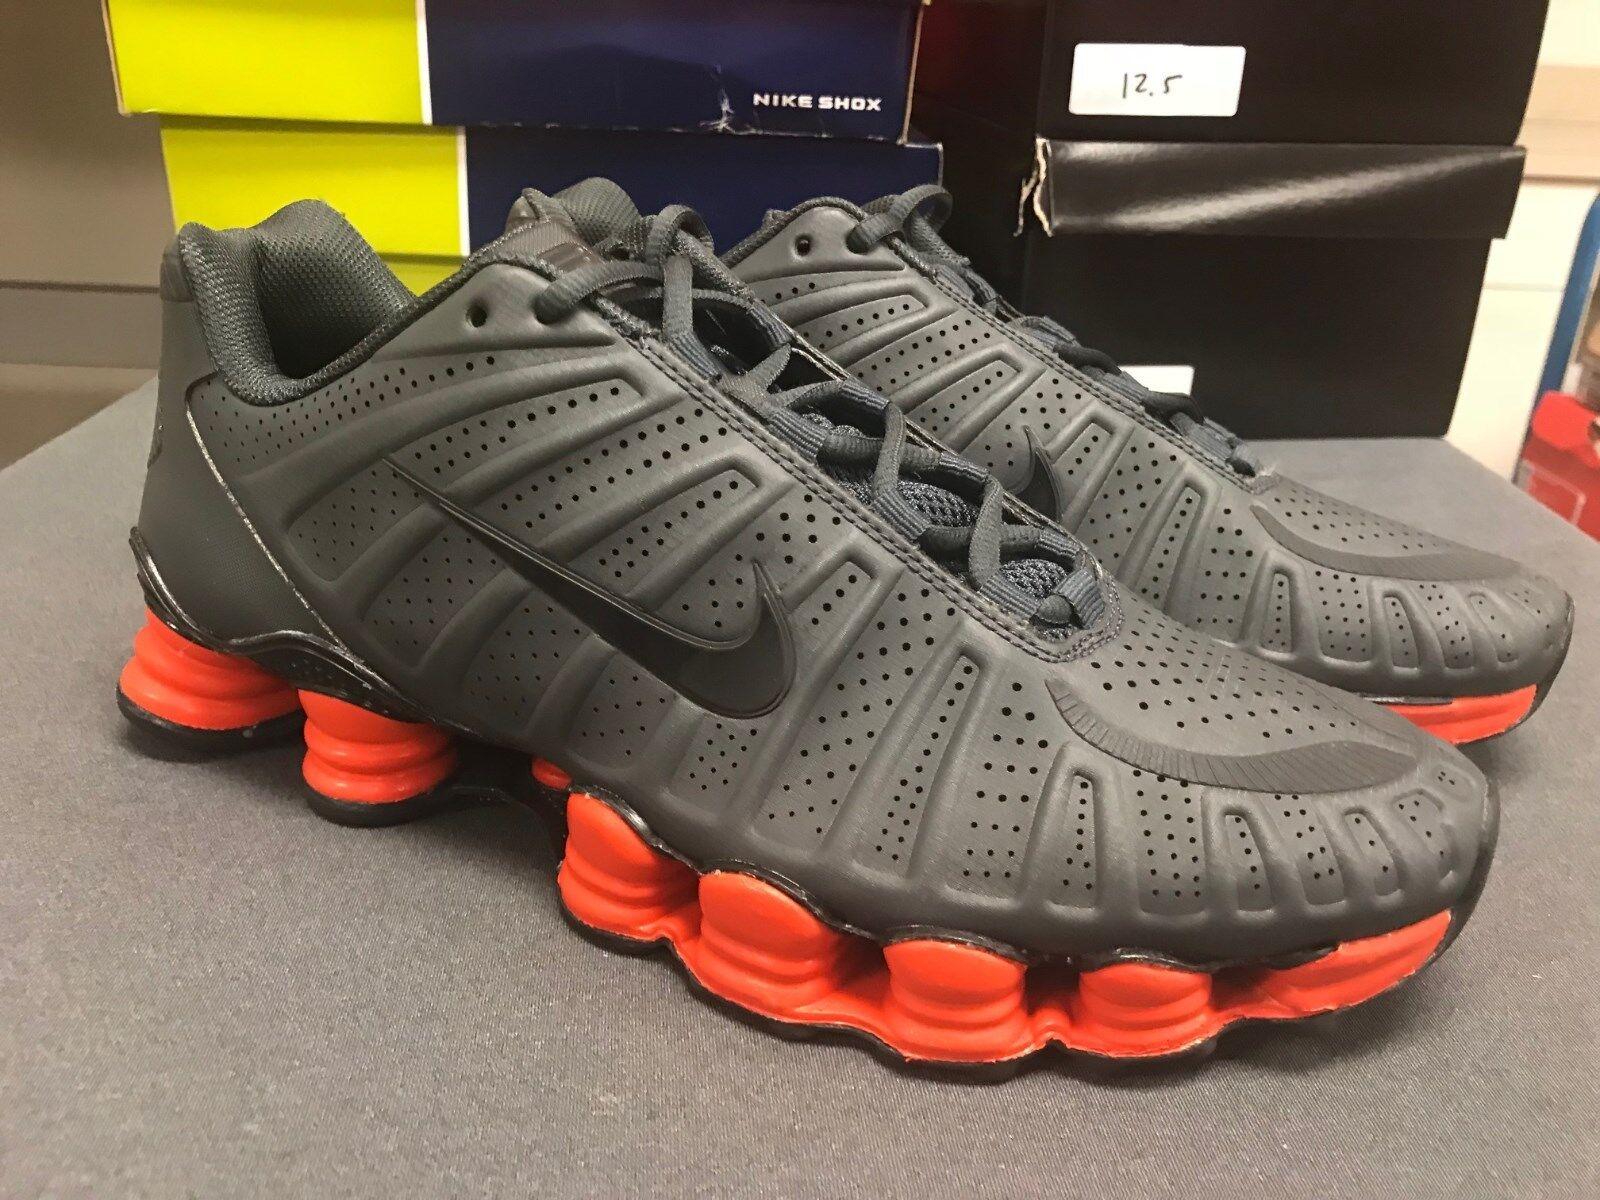 Mens Nike Shox TLX Premium Sneakers New, Grey   orange 488313-019 sku